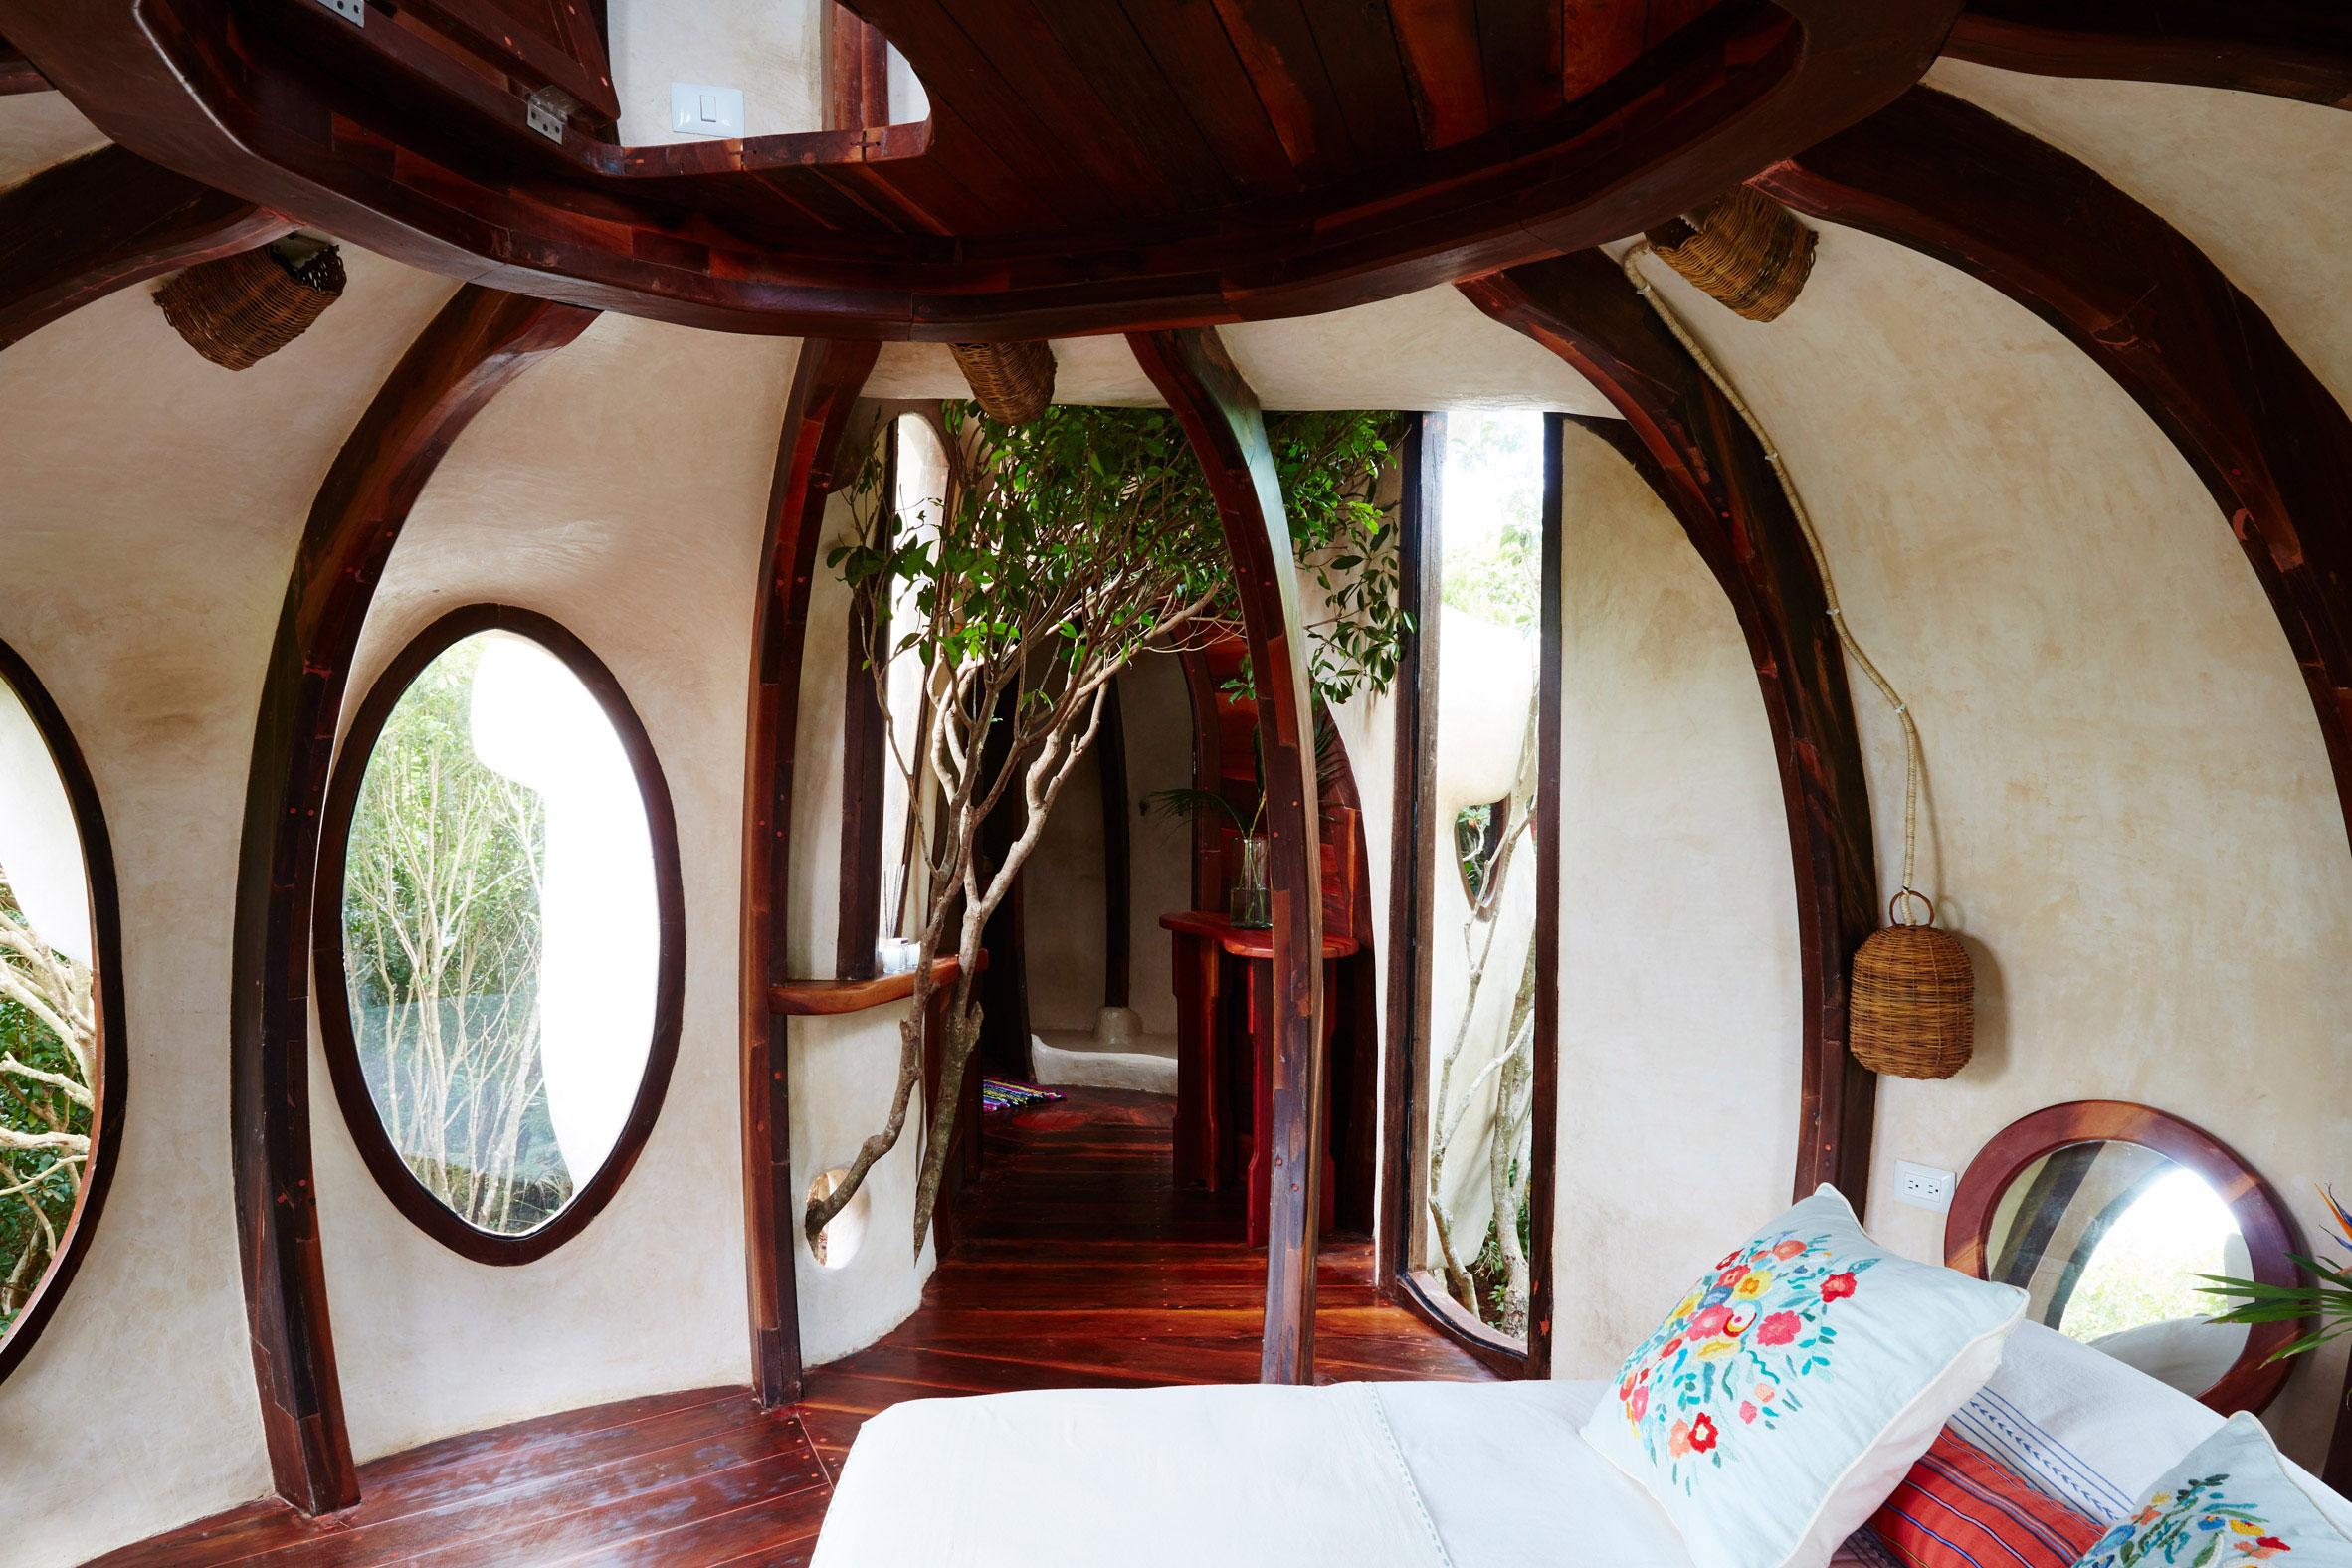 Papaya Playa Project Hotel Room, Tulum, Mexico